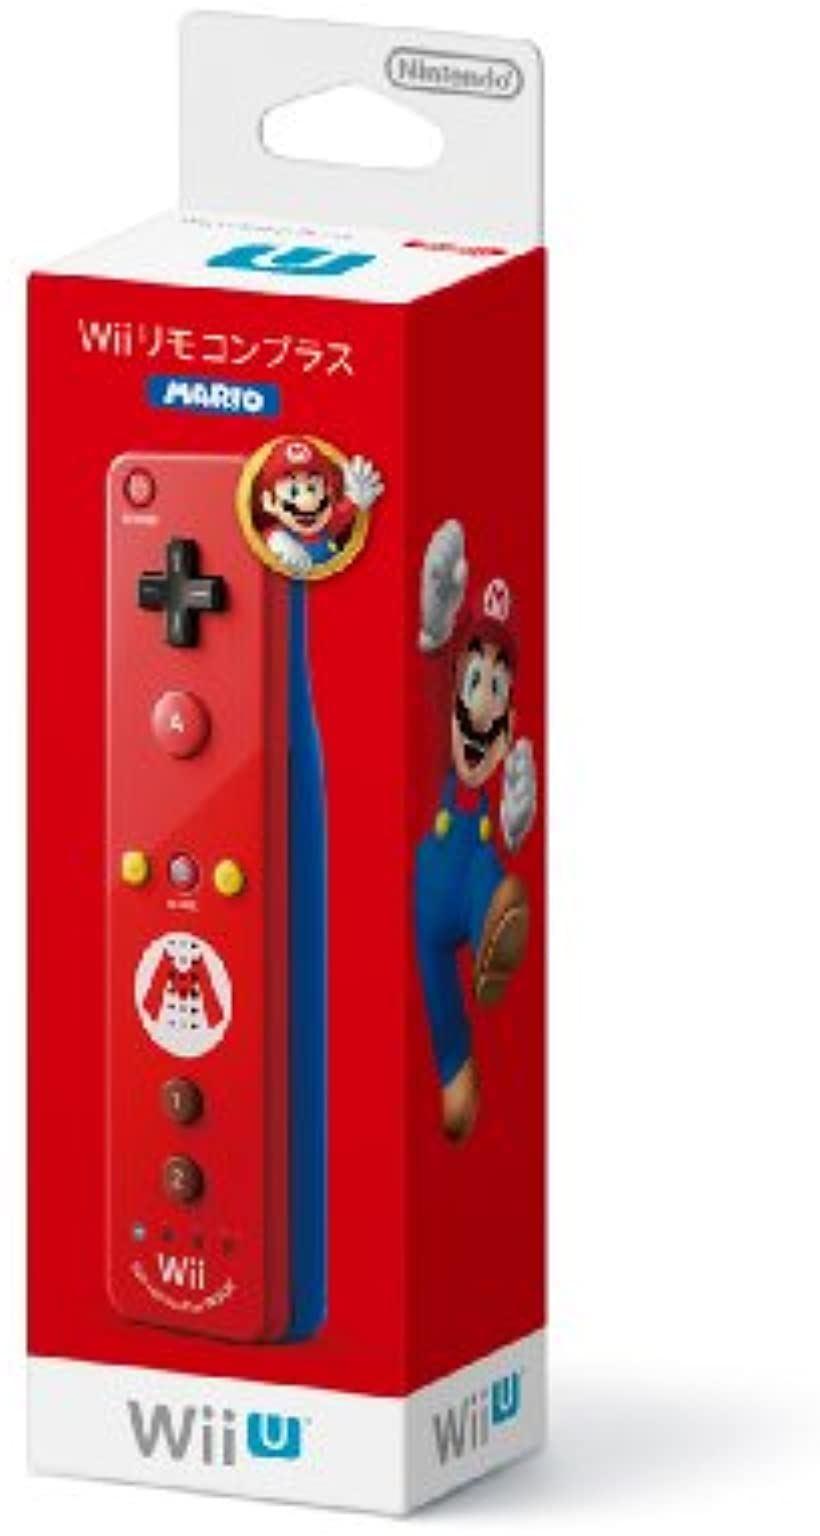 Wiiリモコンプラス マリオ[RVL-A-PNRB](Nintendo Wii)